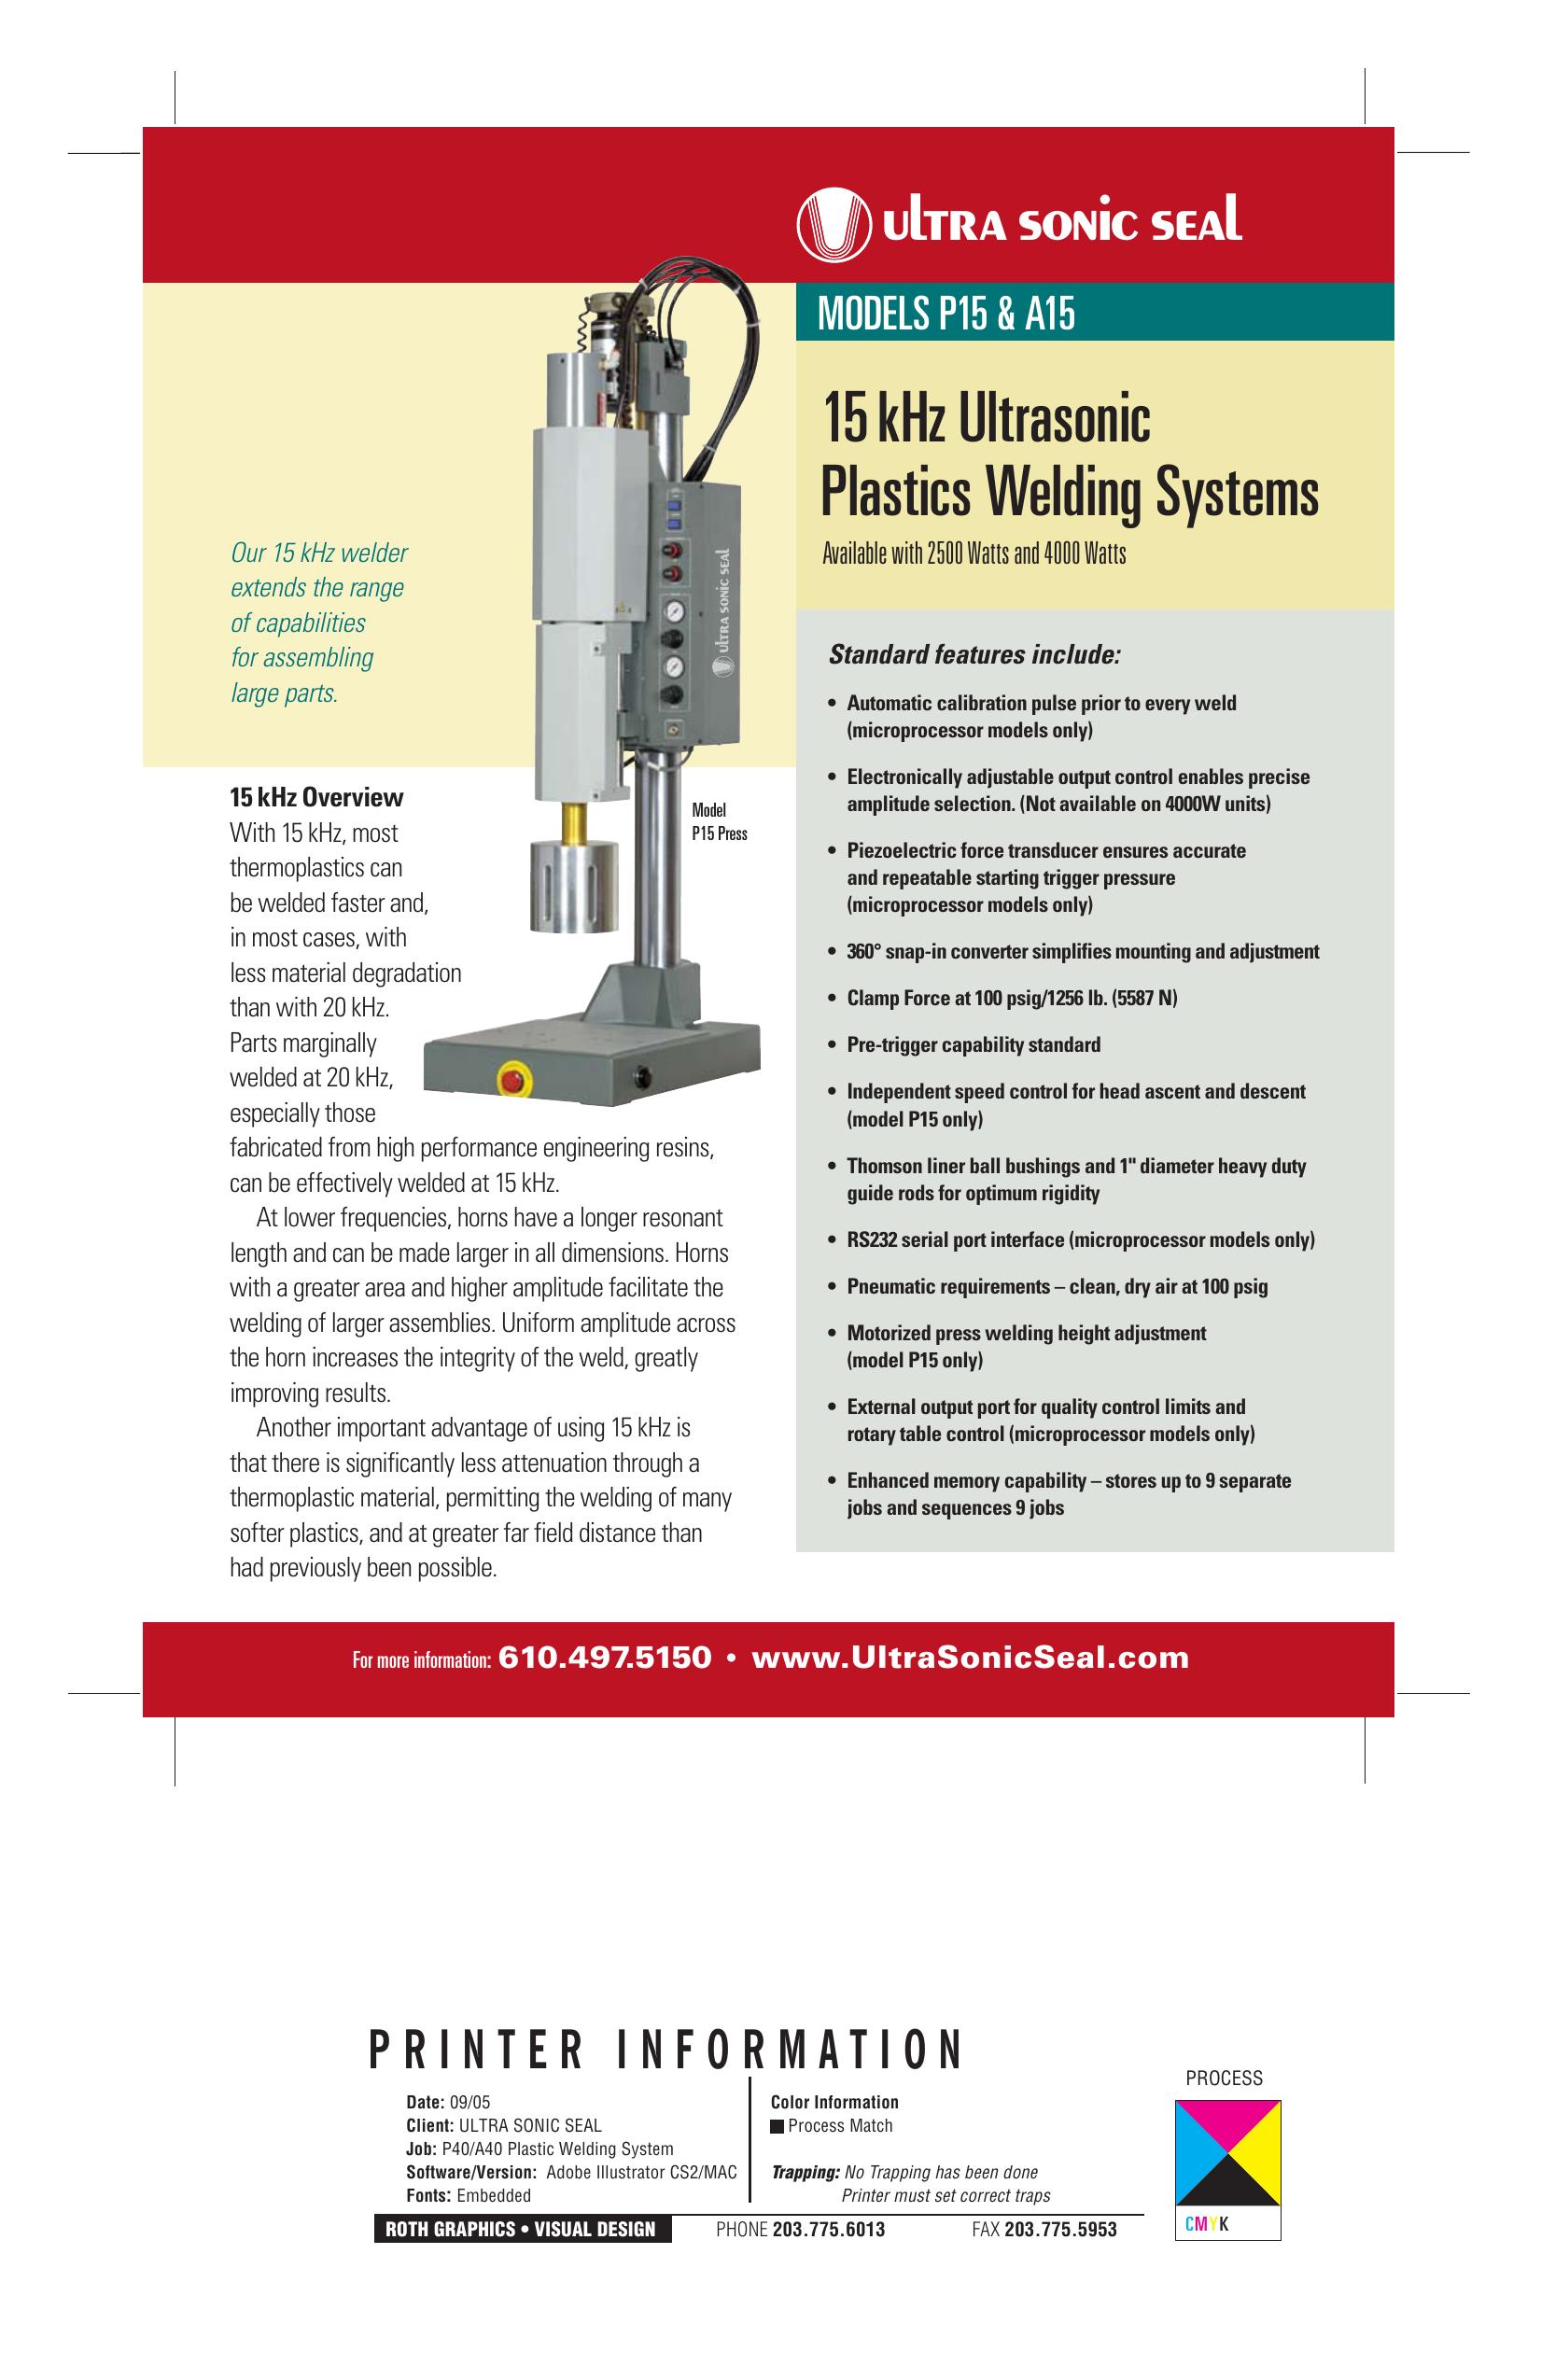 15 kHz Ultrasonic Plastics Welding Systems | manualzz com